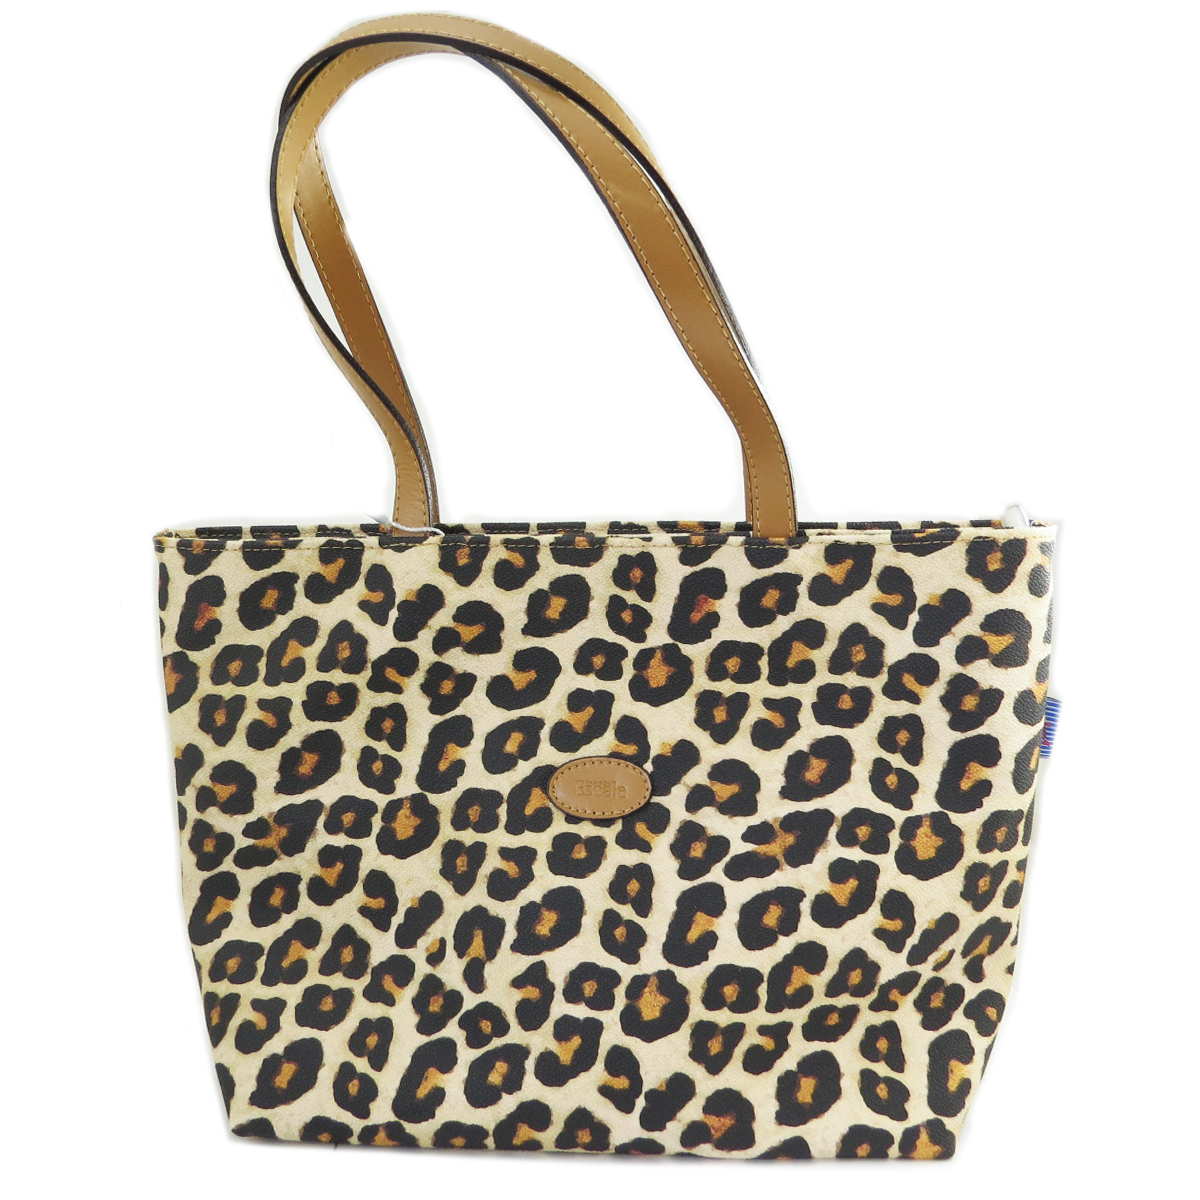 Sac shopping artisanal \'Léopard\' marron - 34x225x11 cm - [R0462]